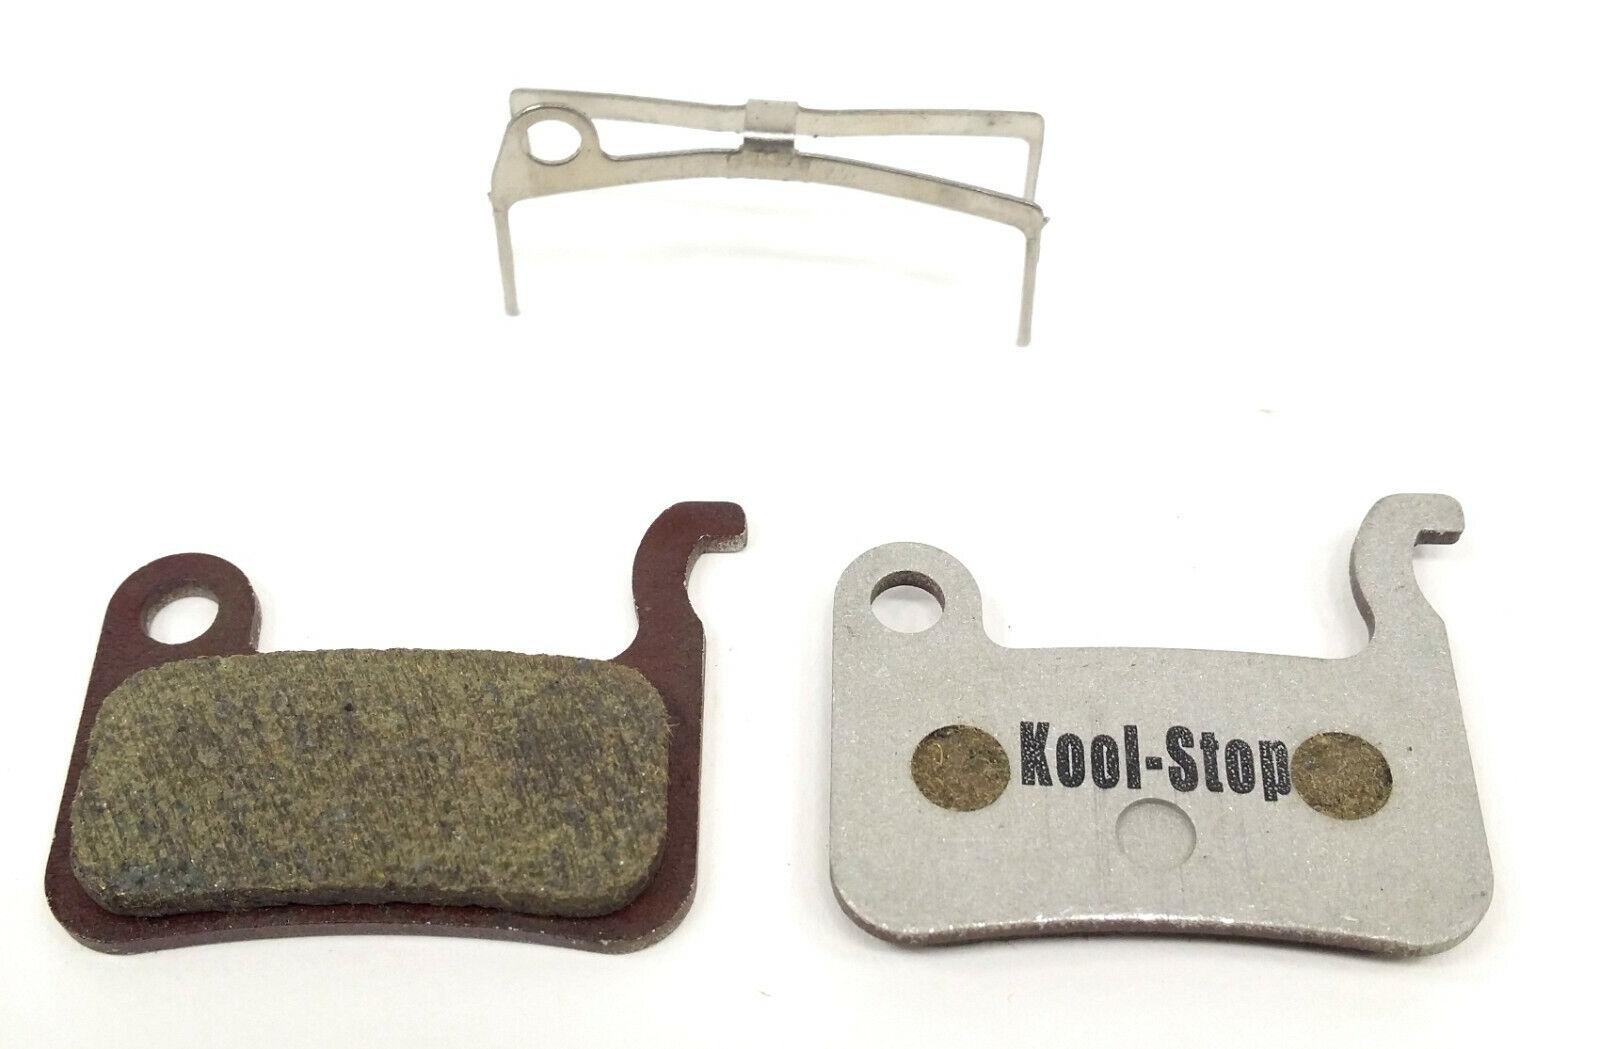 Koolstop D630A Brake Shoes K//s Disc Shi Xtr Aly Organic-m960//965//966//975//m765